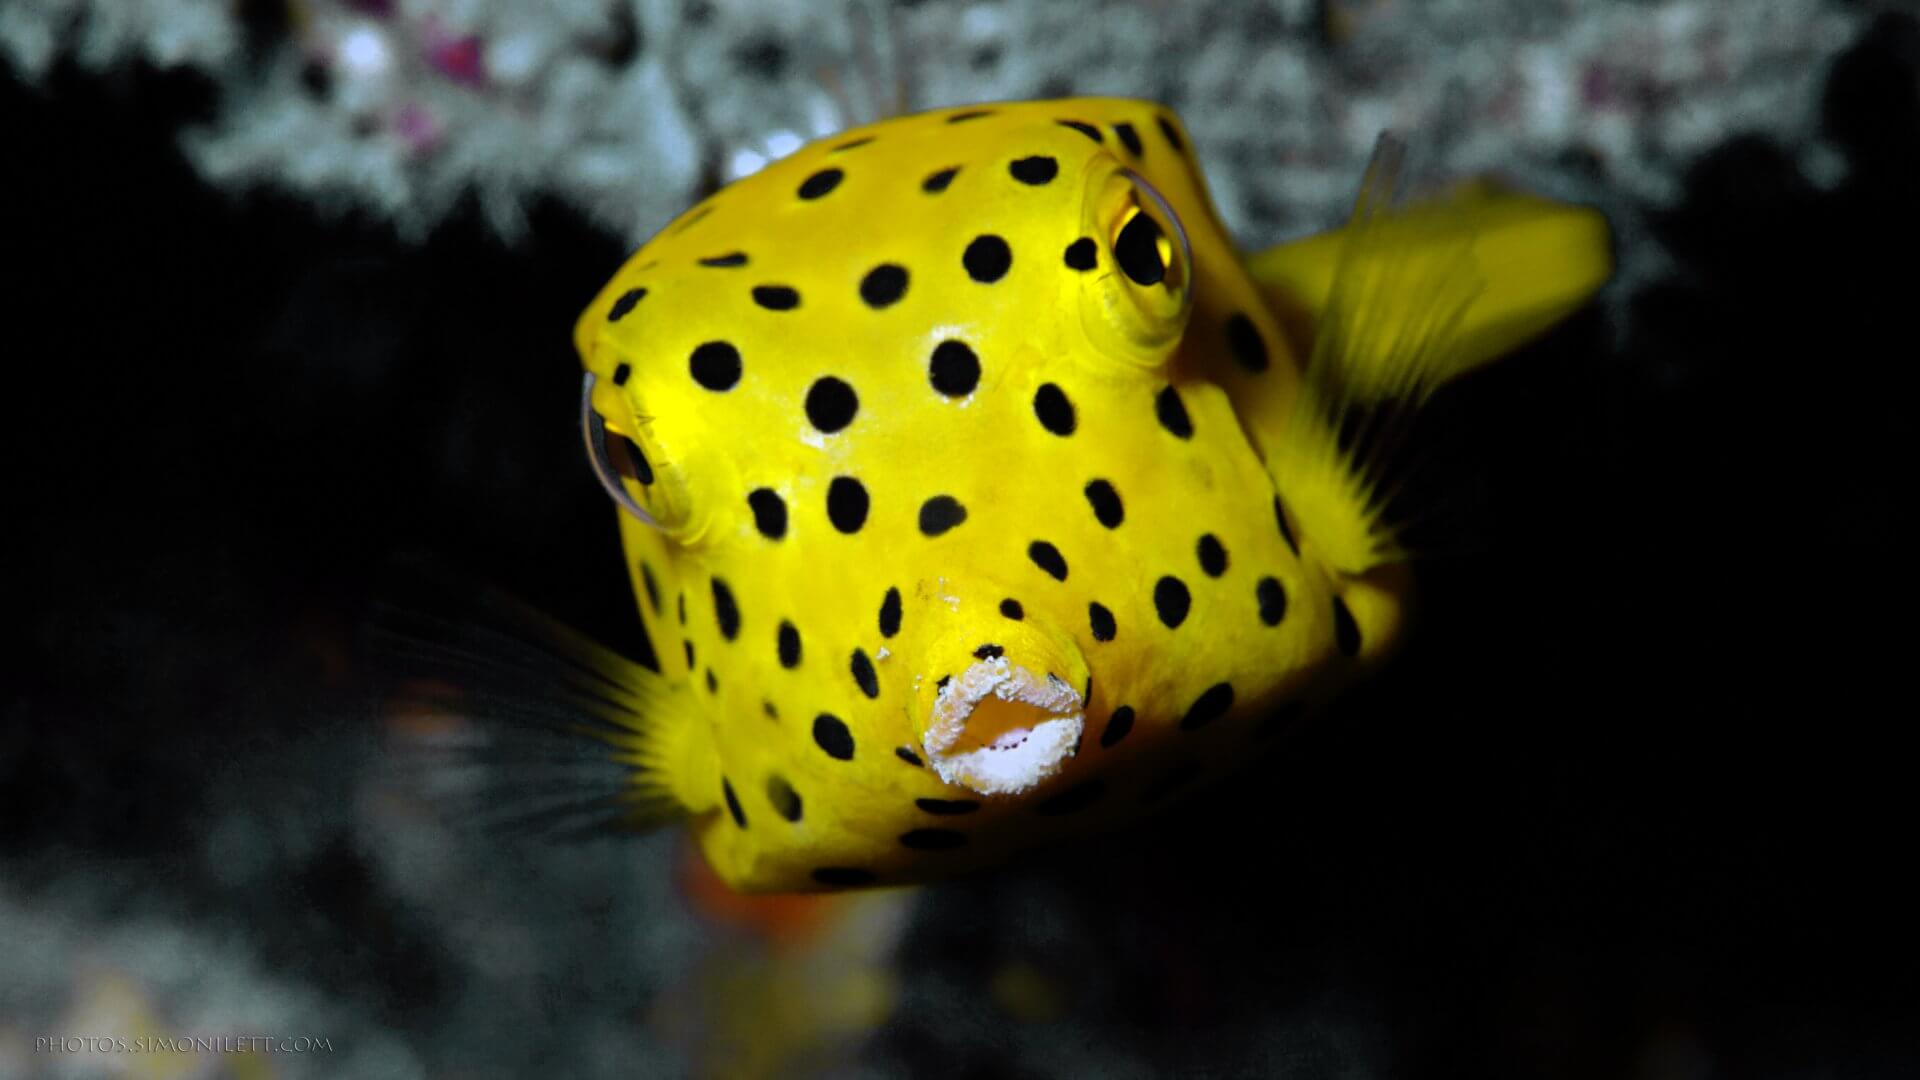 The Juvenile Yellow Box Fish